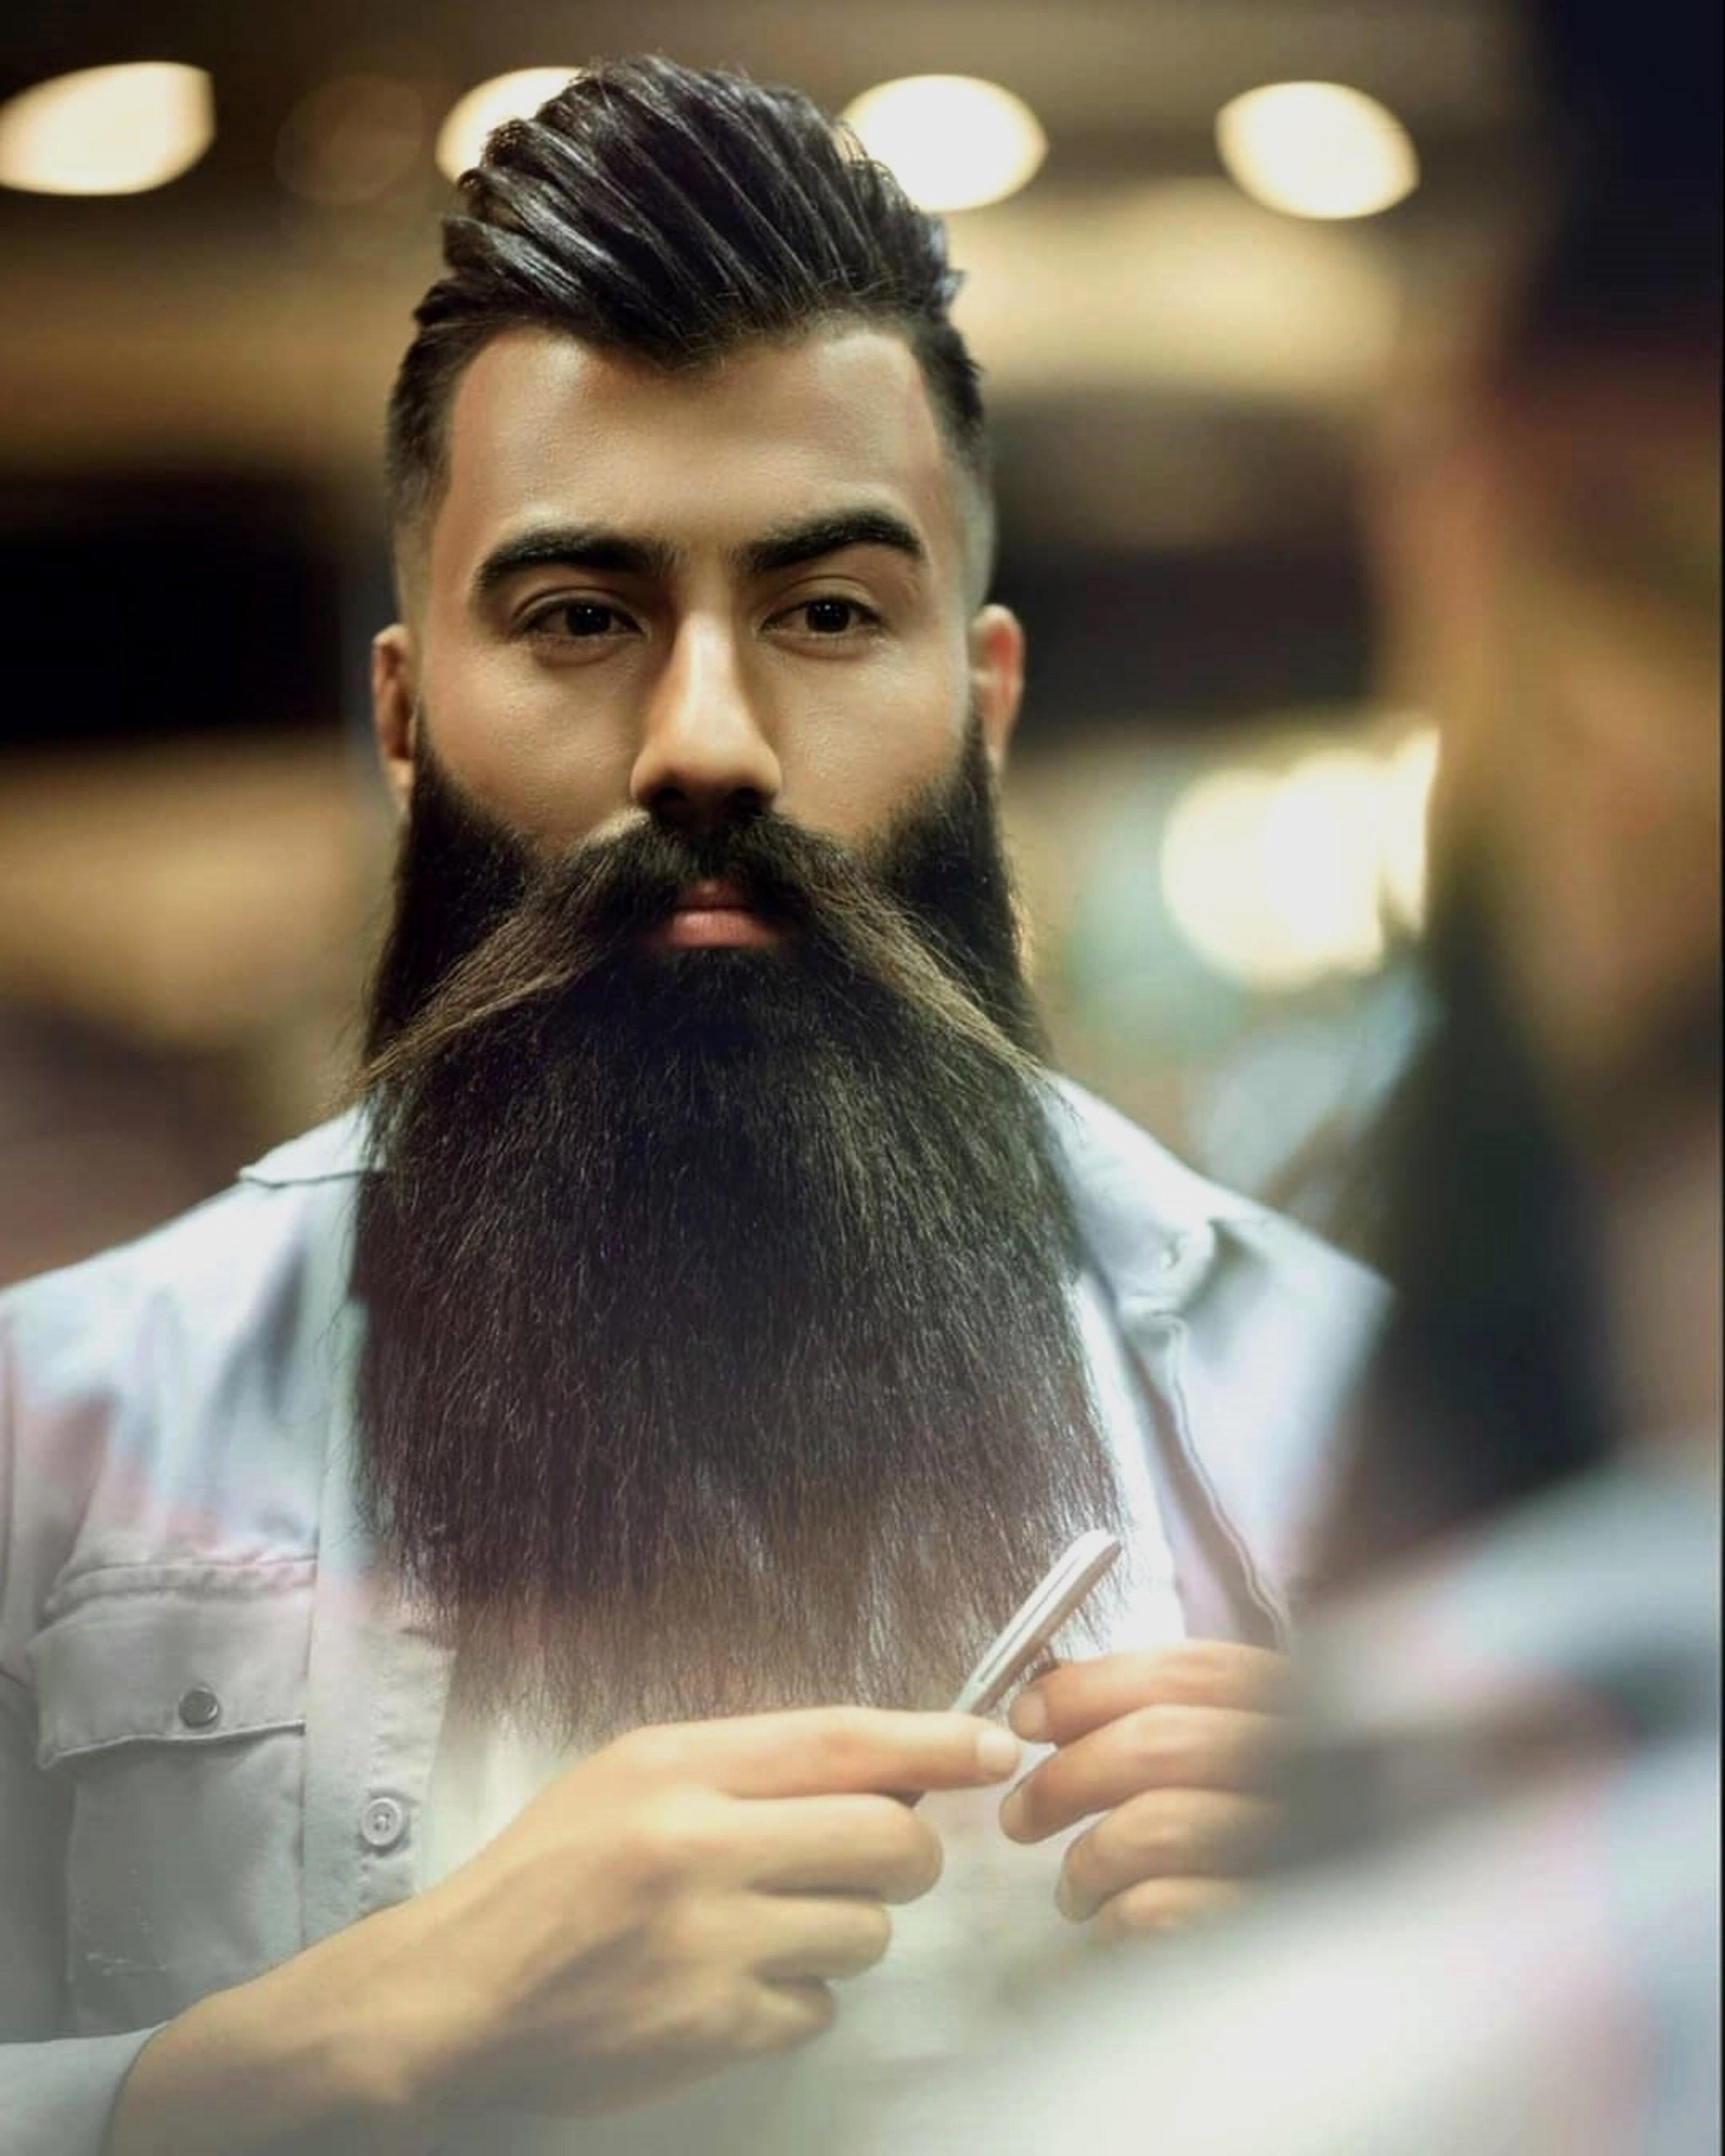 A long beard look for fashionable guys.